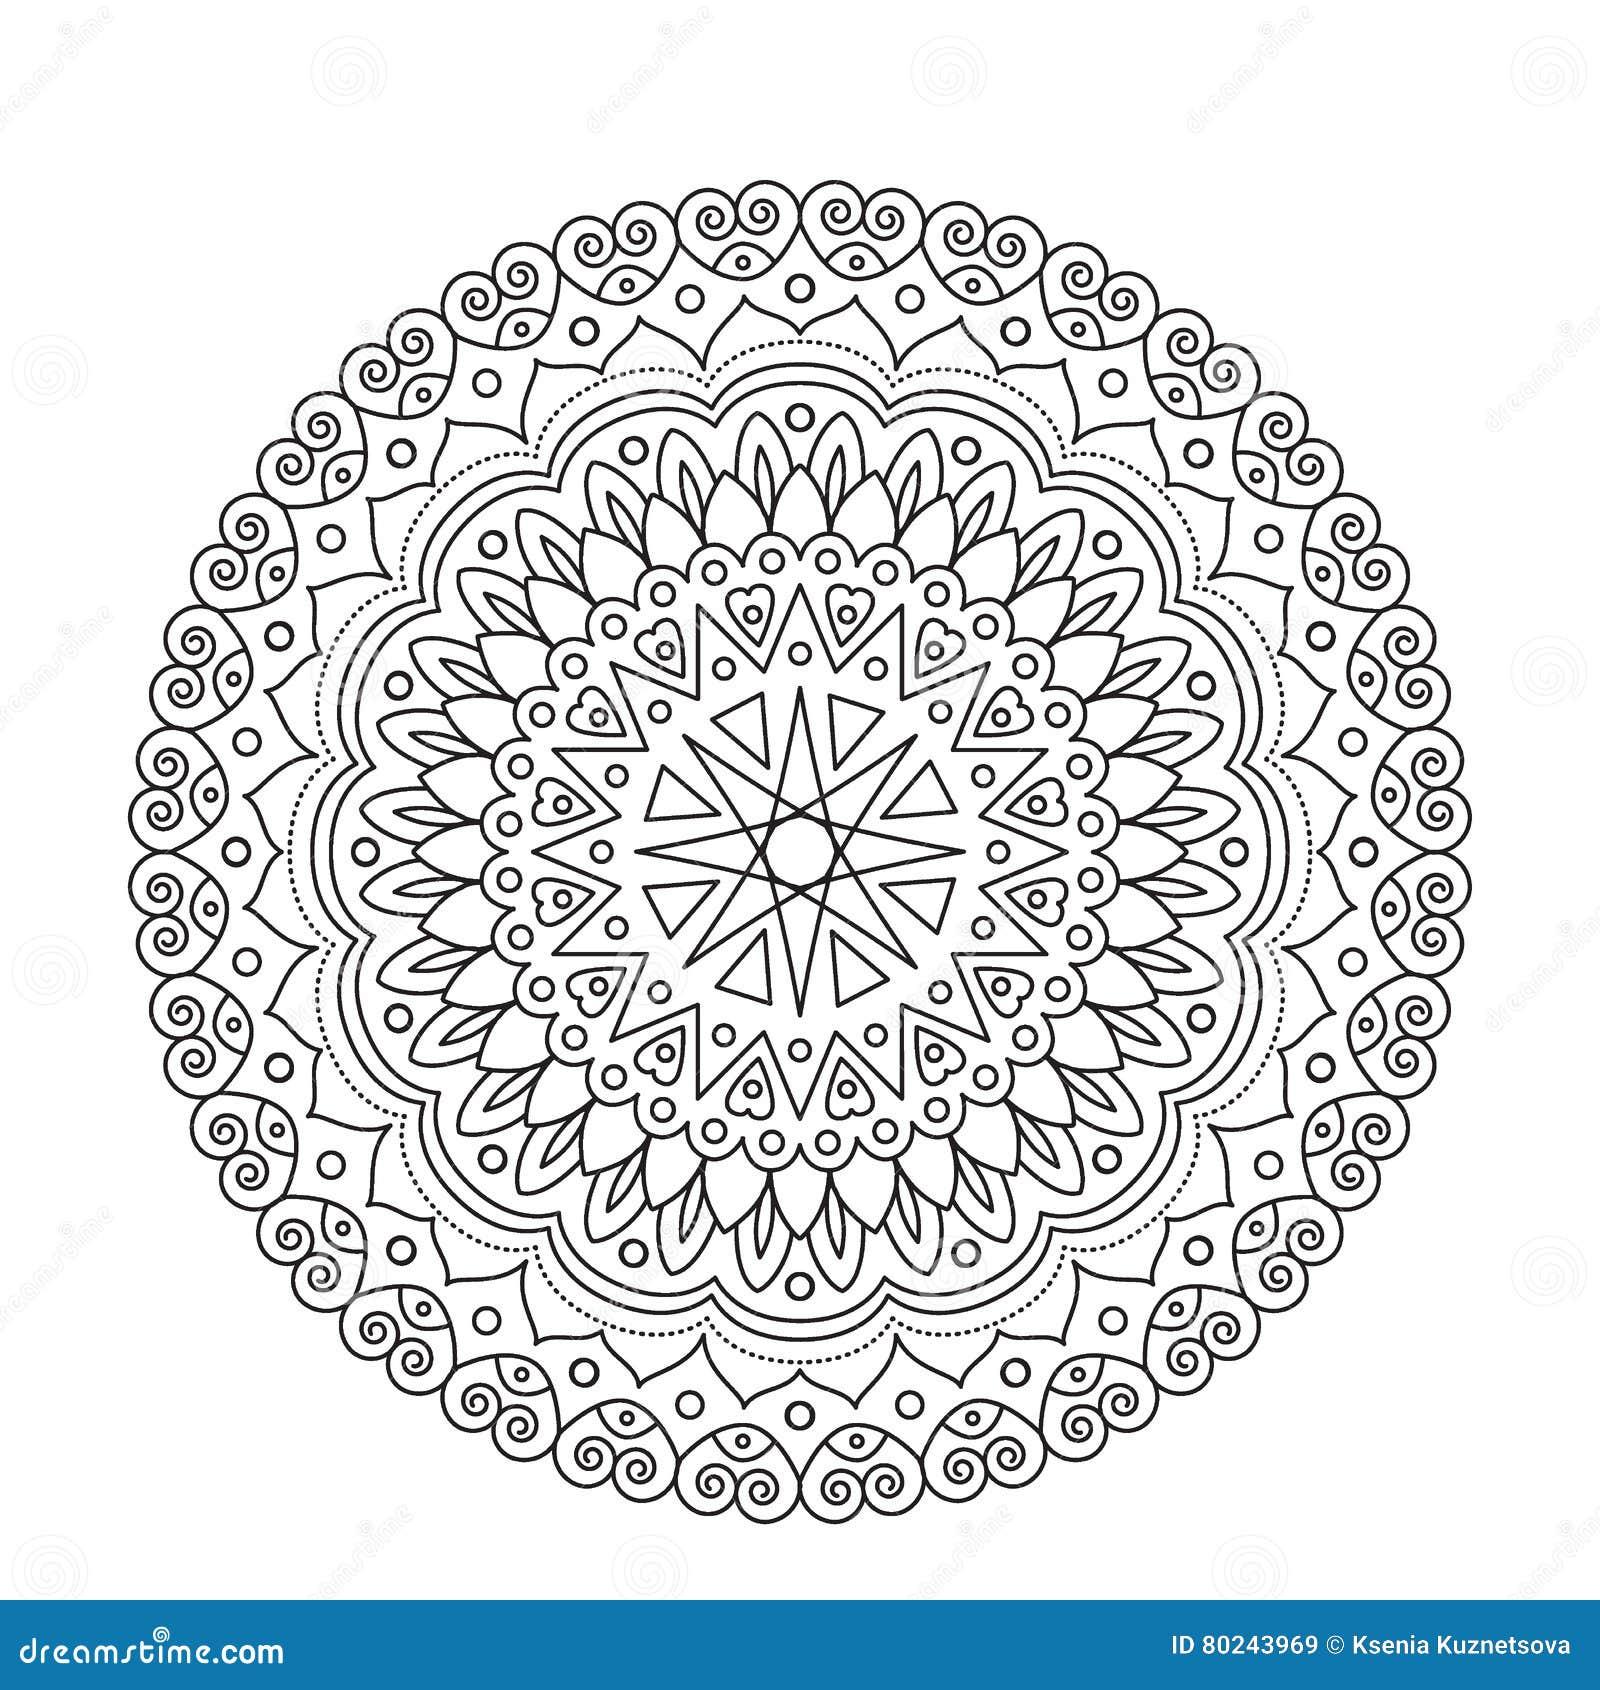 Coloring Book Mandala. Circle Lace Ornament, Round